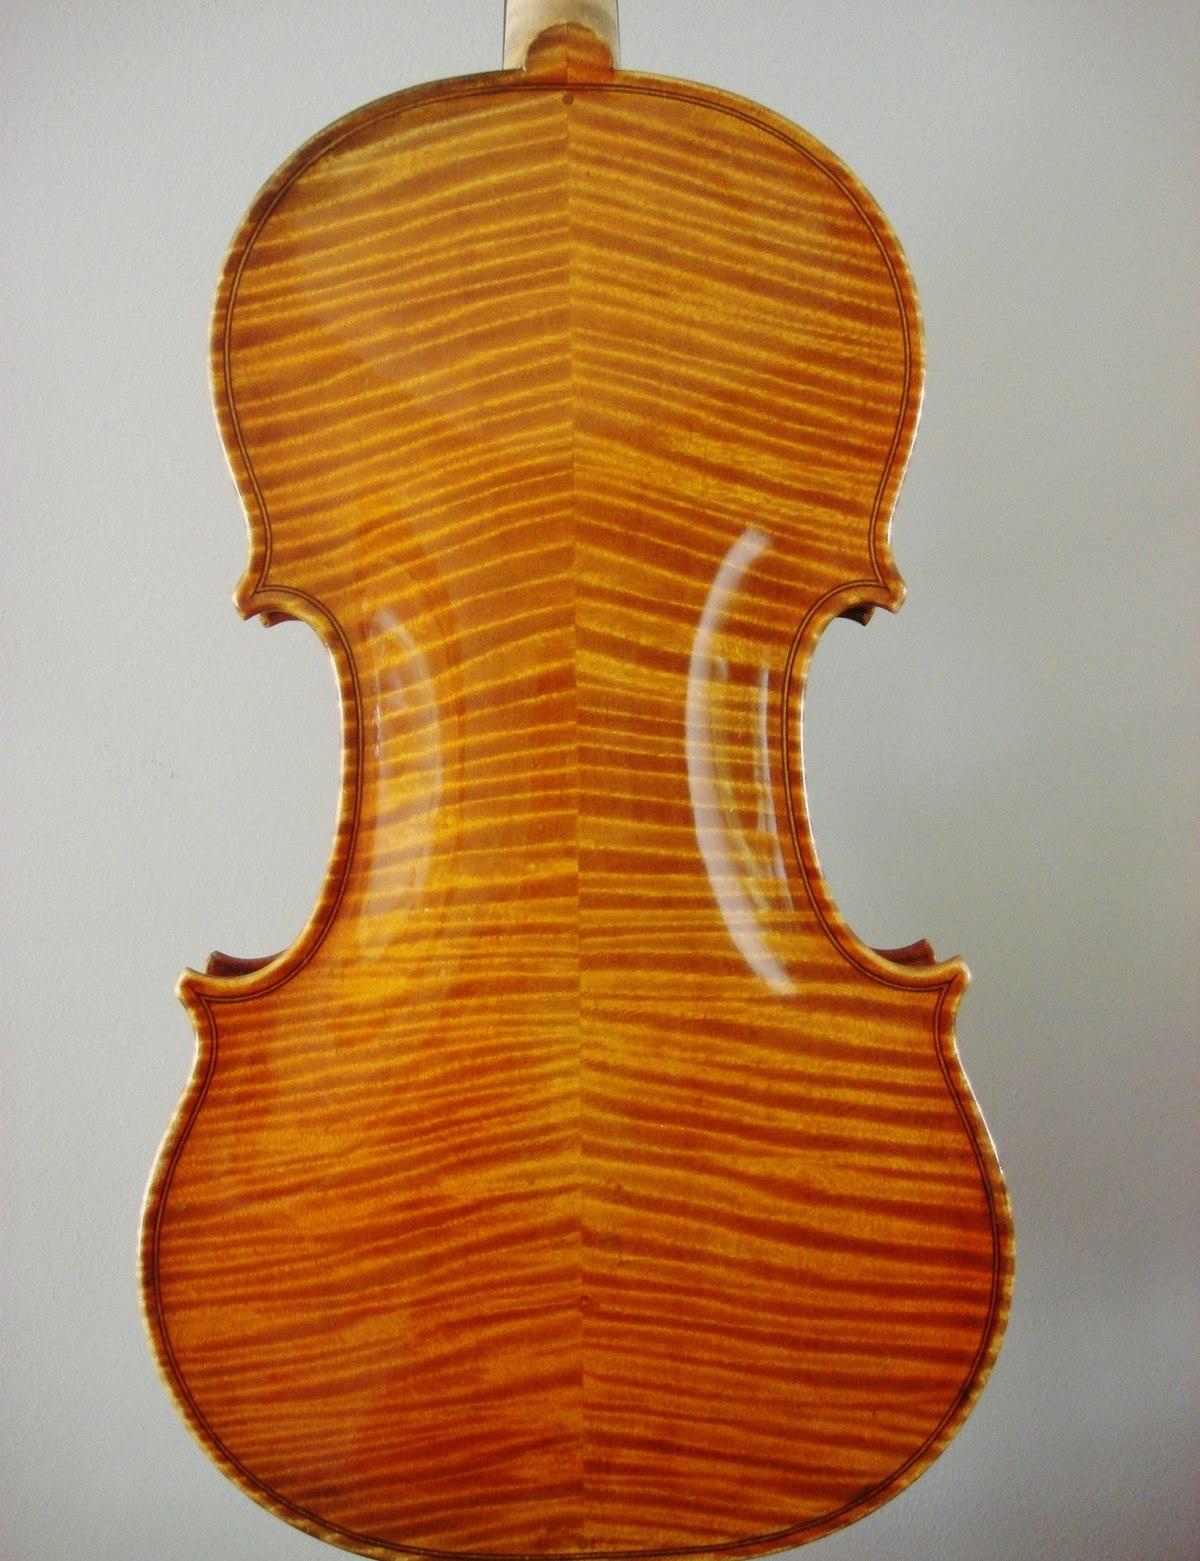 Old wood minerale interior of violin - Old Wood Minerale Interior Of Violin 16